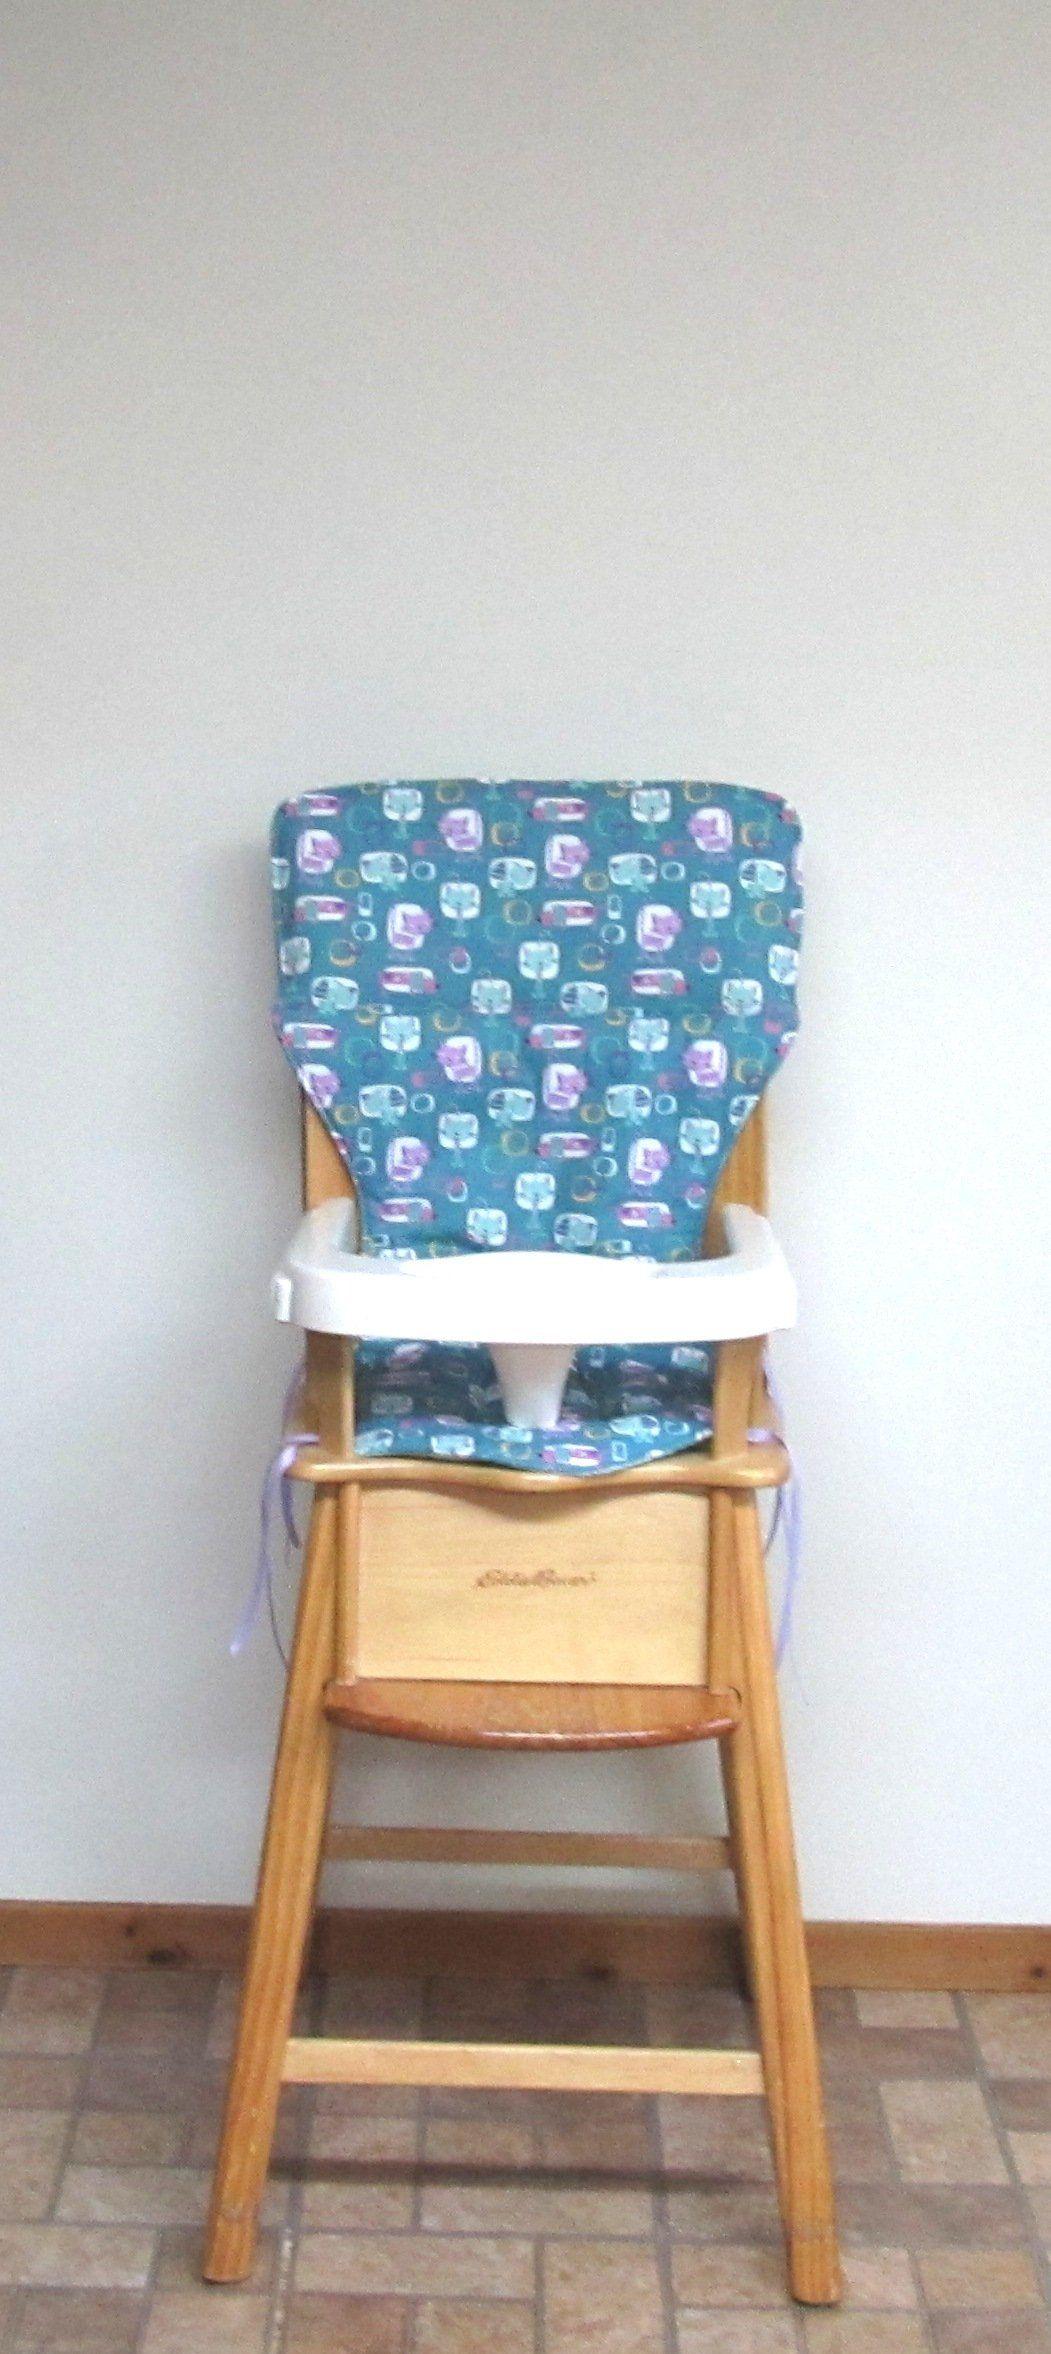 Wooden High Chair Pad Eddie Bauer Cotton Replacement Cushion